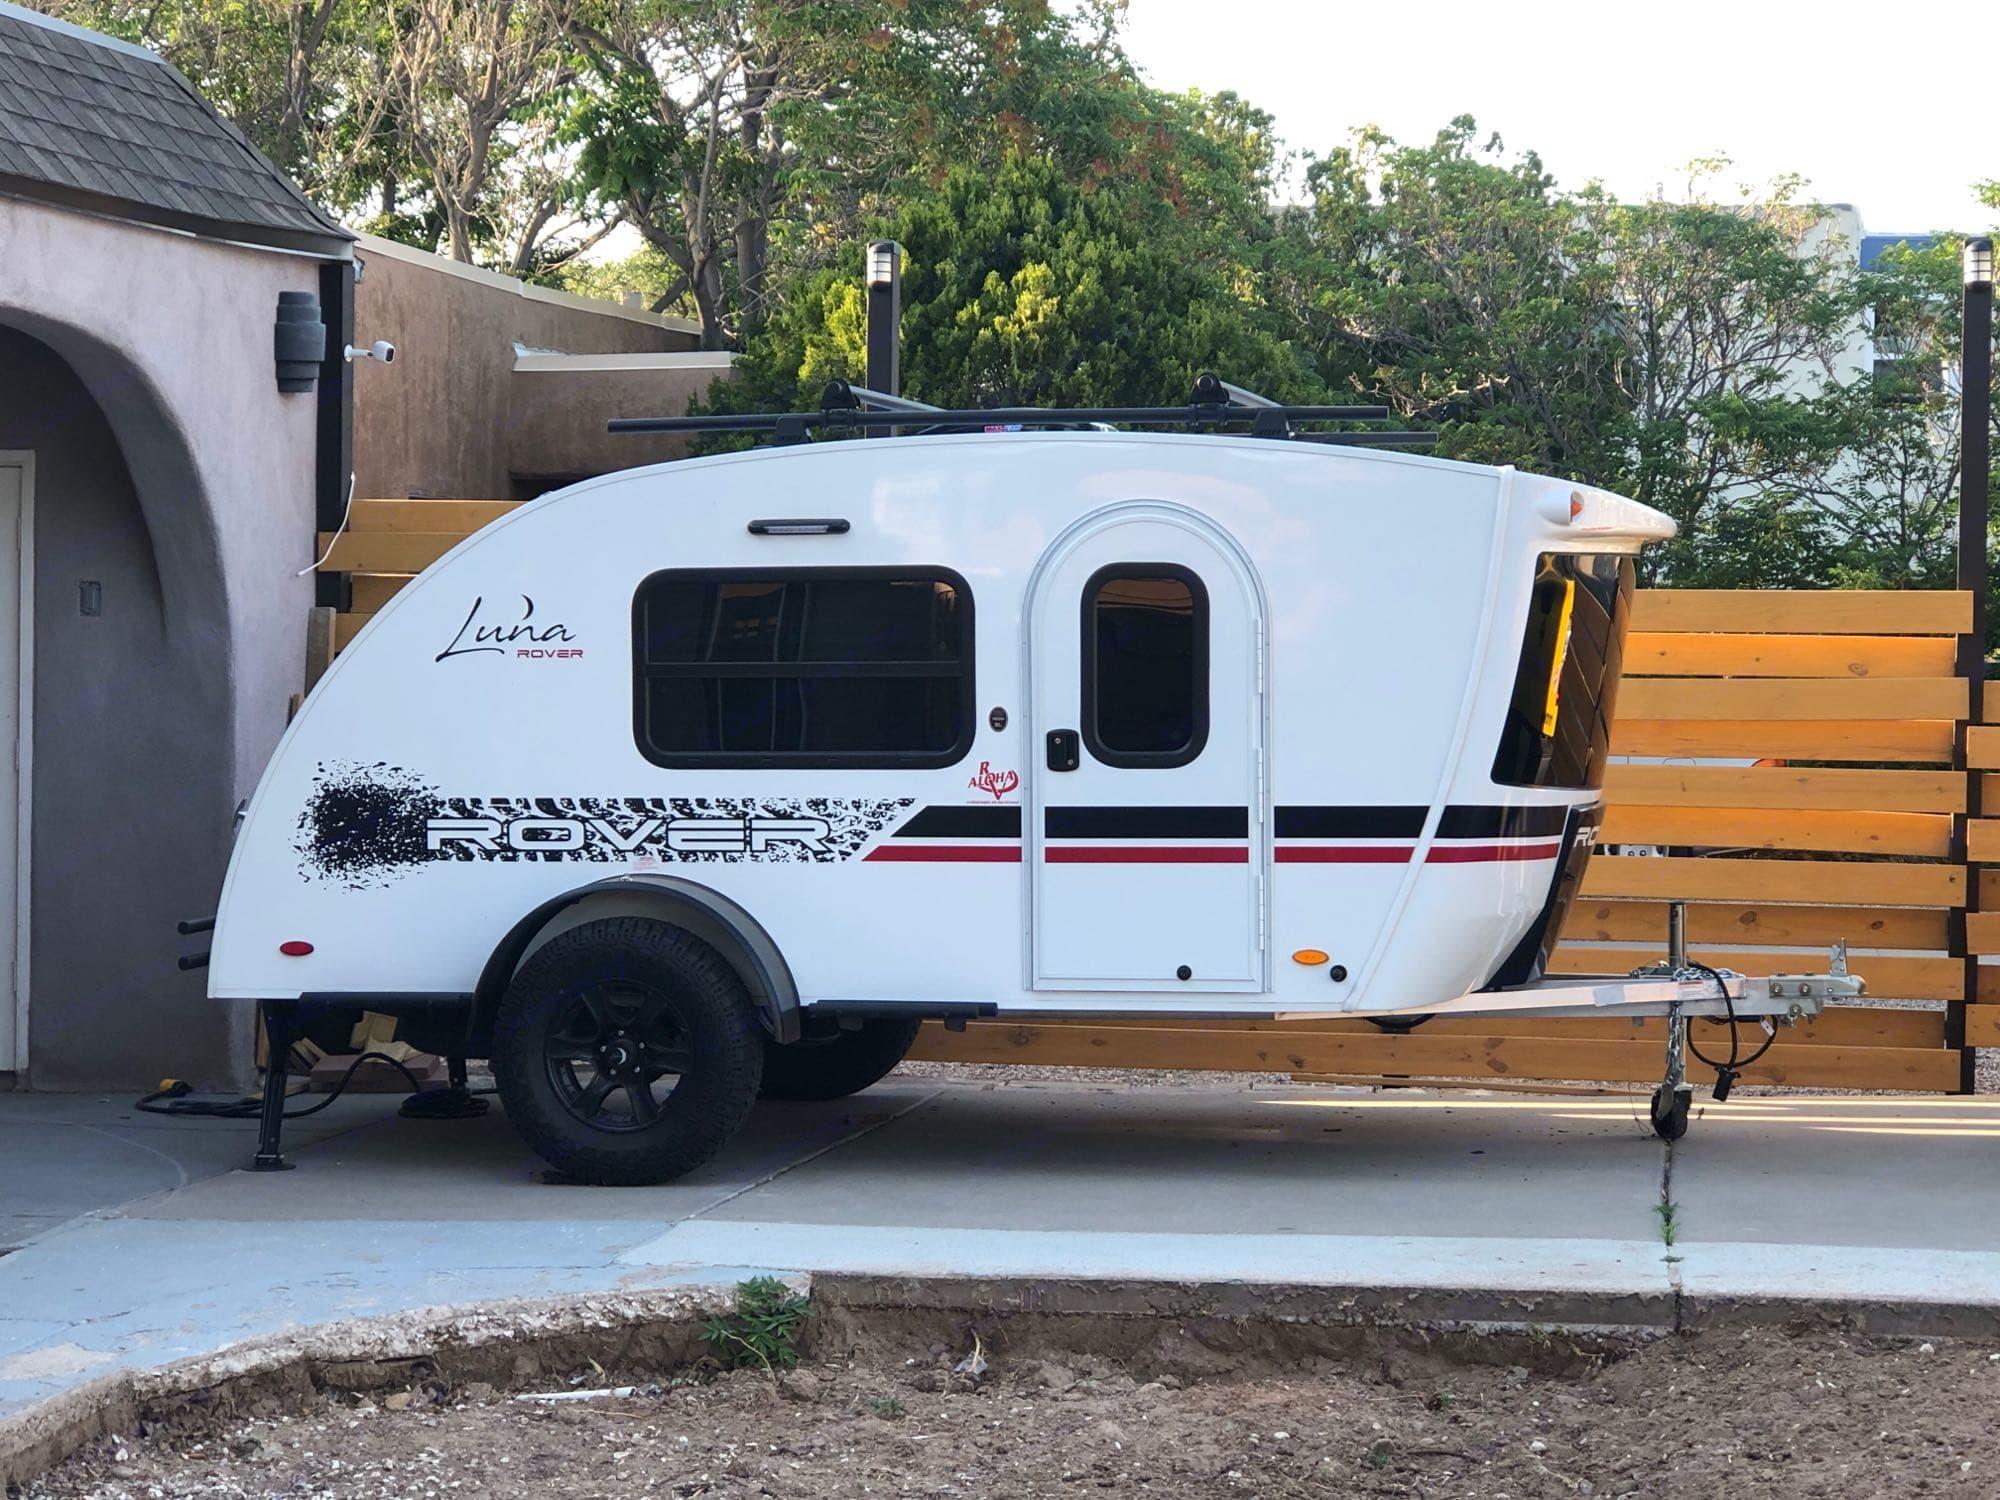 Actual Unit in my driveway. inTech Luna Rover 2020